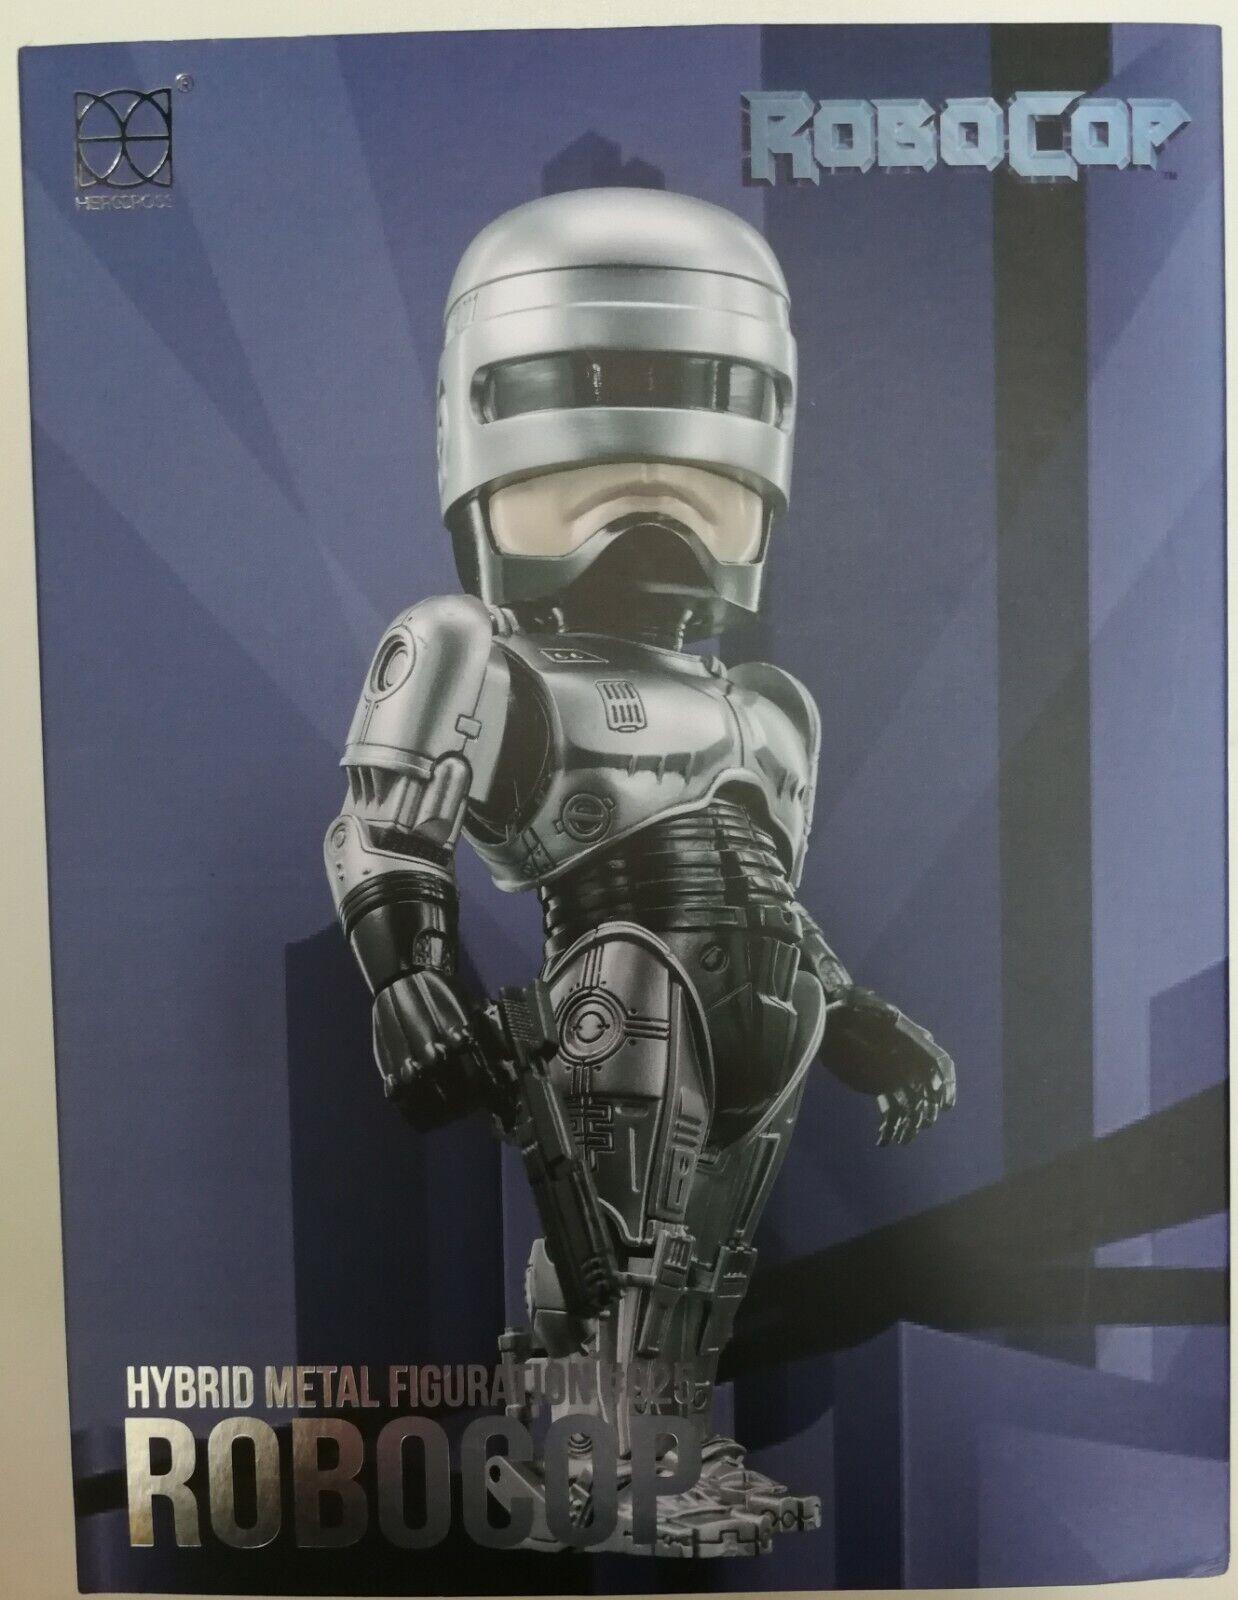 1987 Robocop Herocross Hybrid Metal figuración Figura Sideshow  025 025